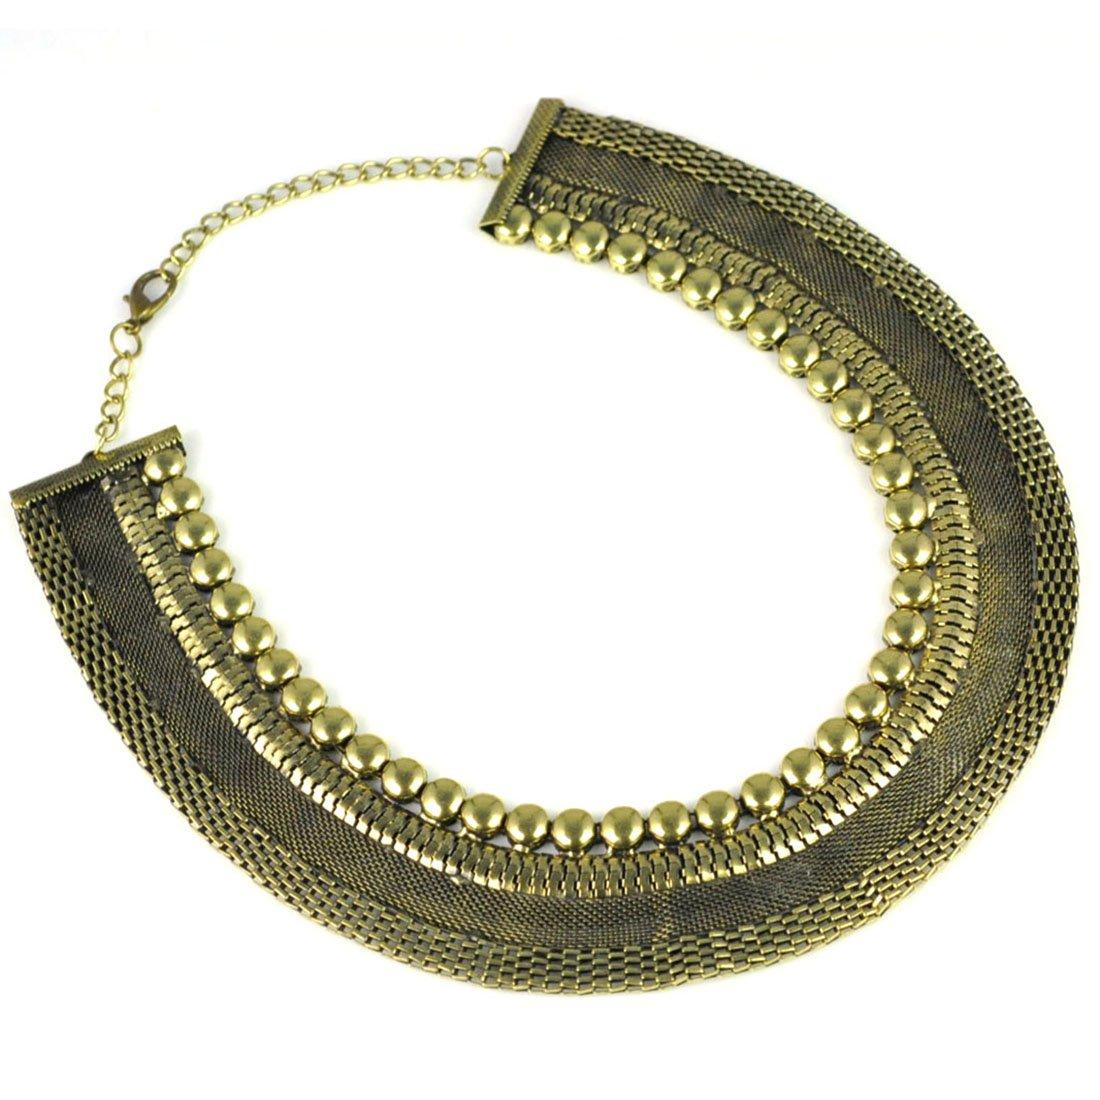 Huan Xun Vintage Egyptian Style Oversized Choker Necklace